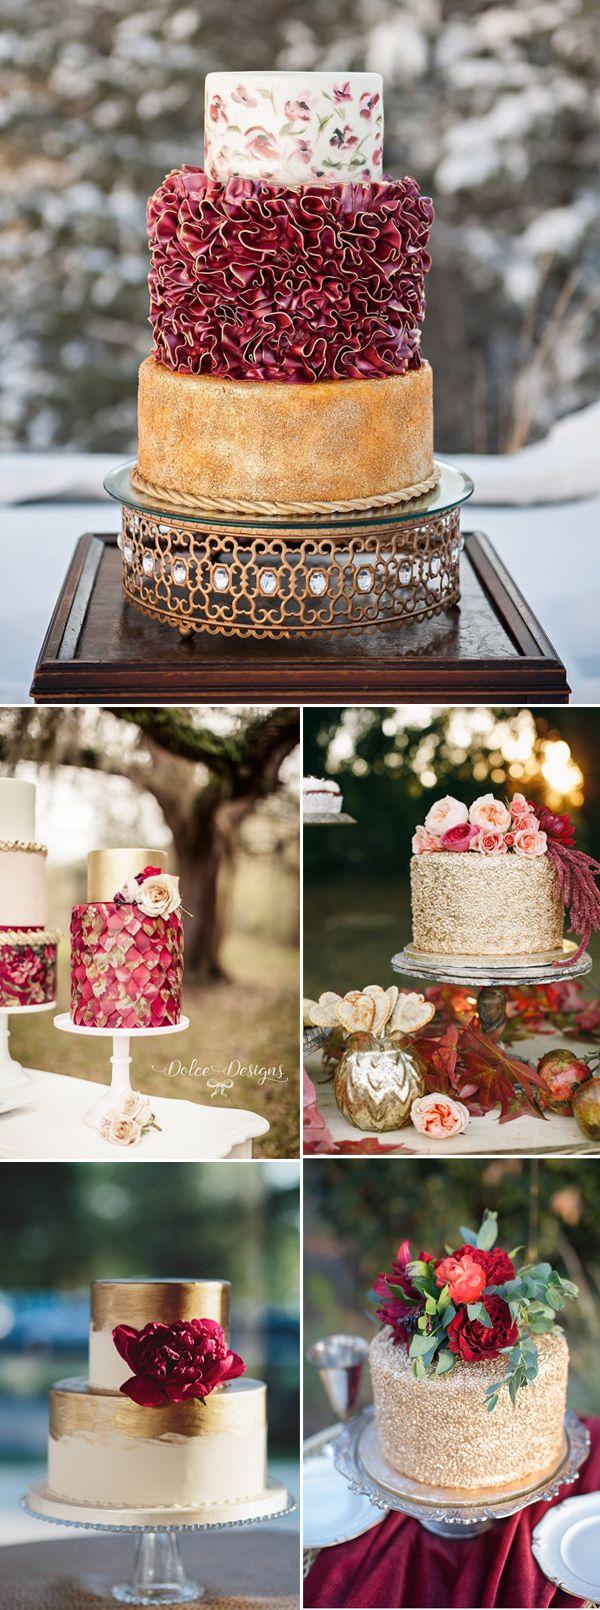 26 Gorgeous Wedding Cakes For Your Autumn Marsala Weddings GoldMarsala And